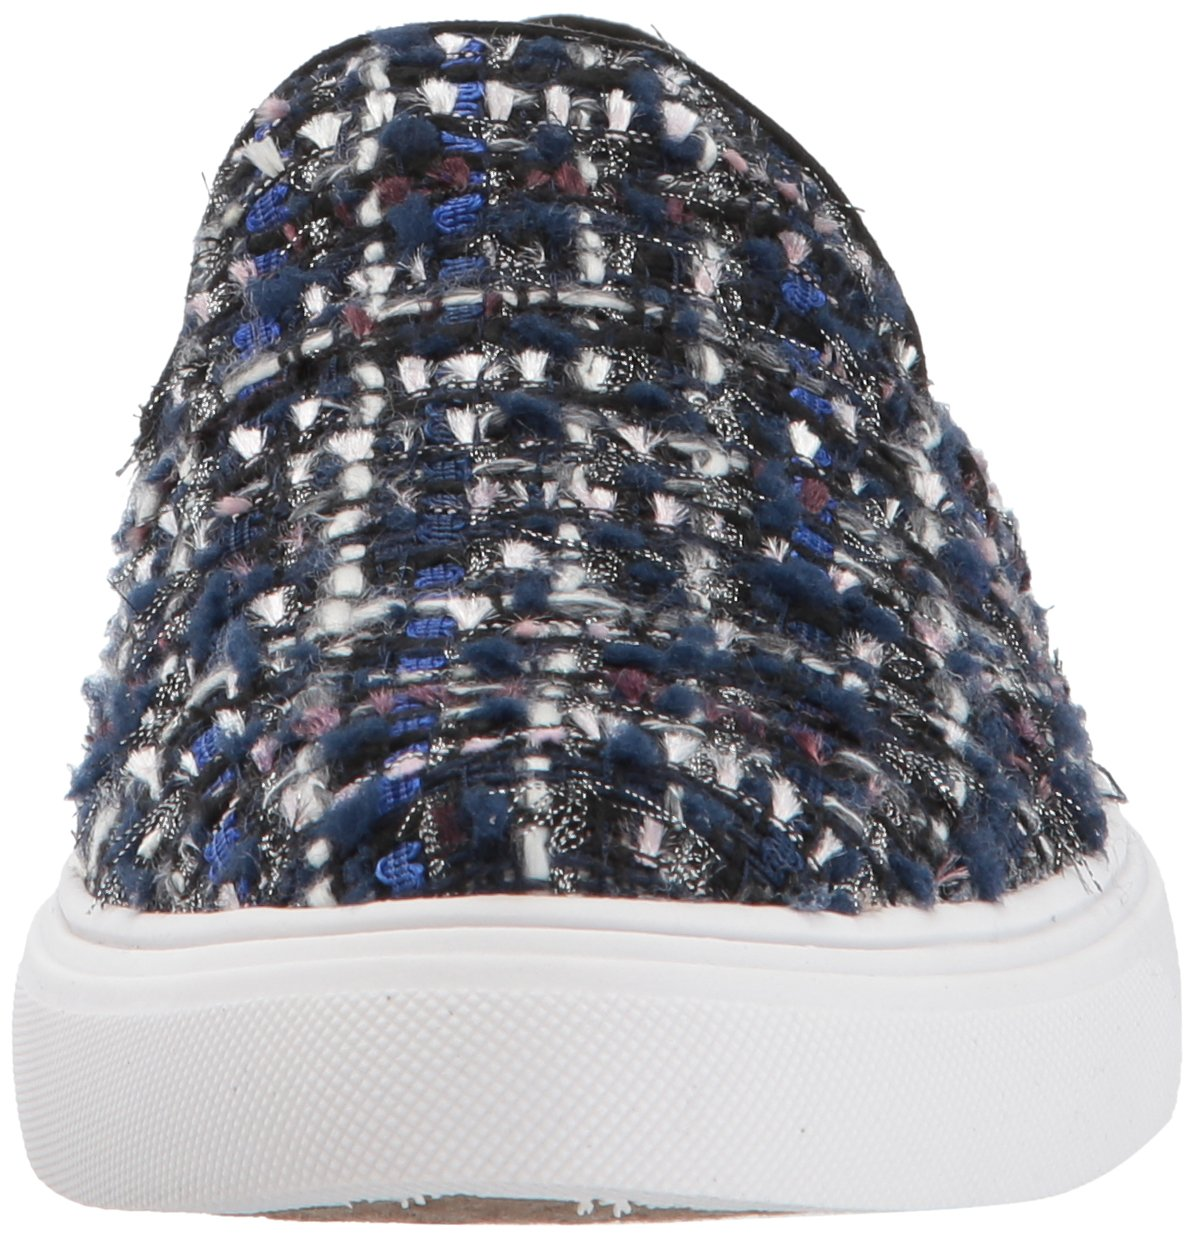 Franco Sarto Women's Mony Sneaker B071VCN28J 5 B(M) US|Black/Blue